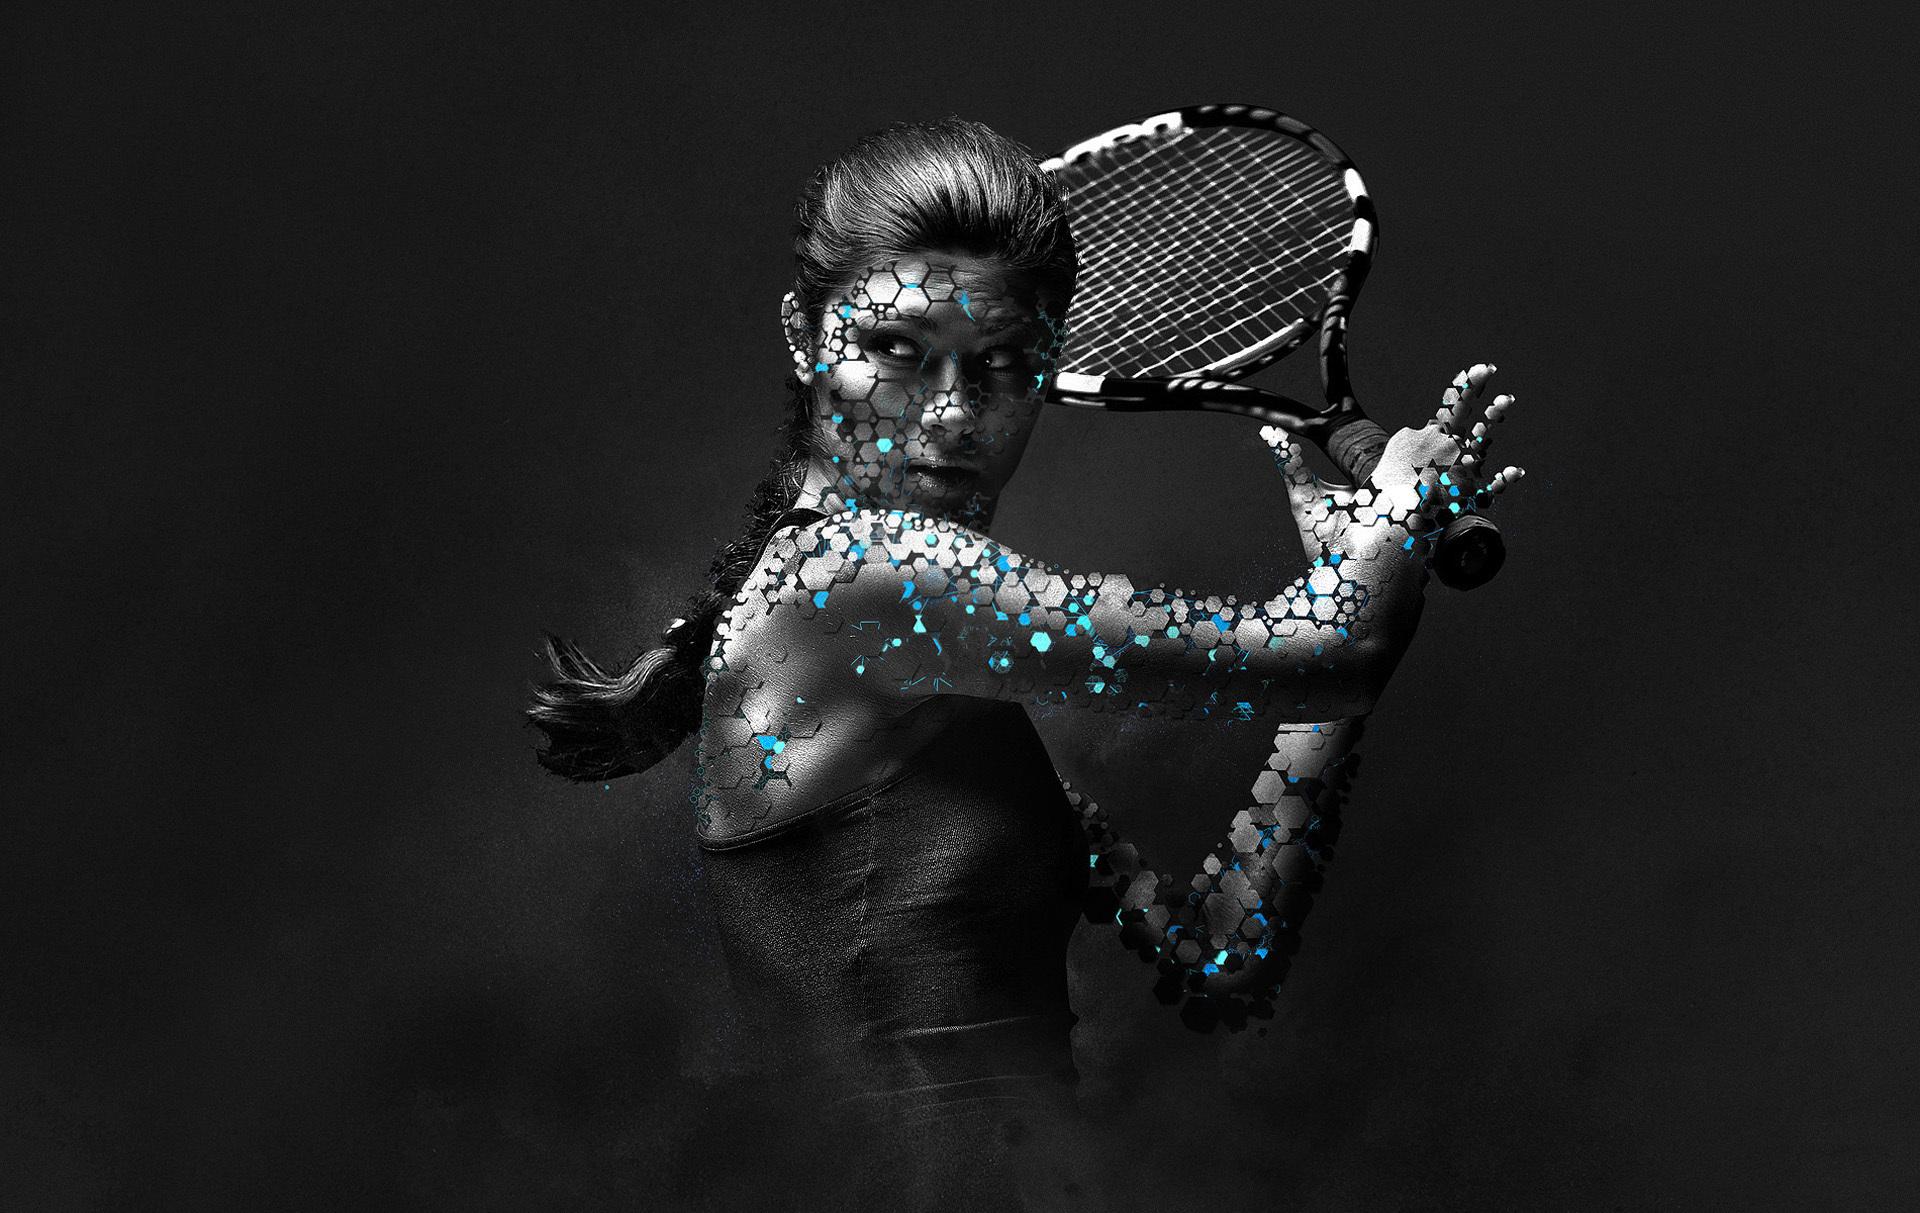 3d Sports Backgrounds: Tennis Computer Wallpapers, Desktop Backgrounds